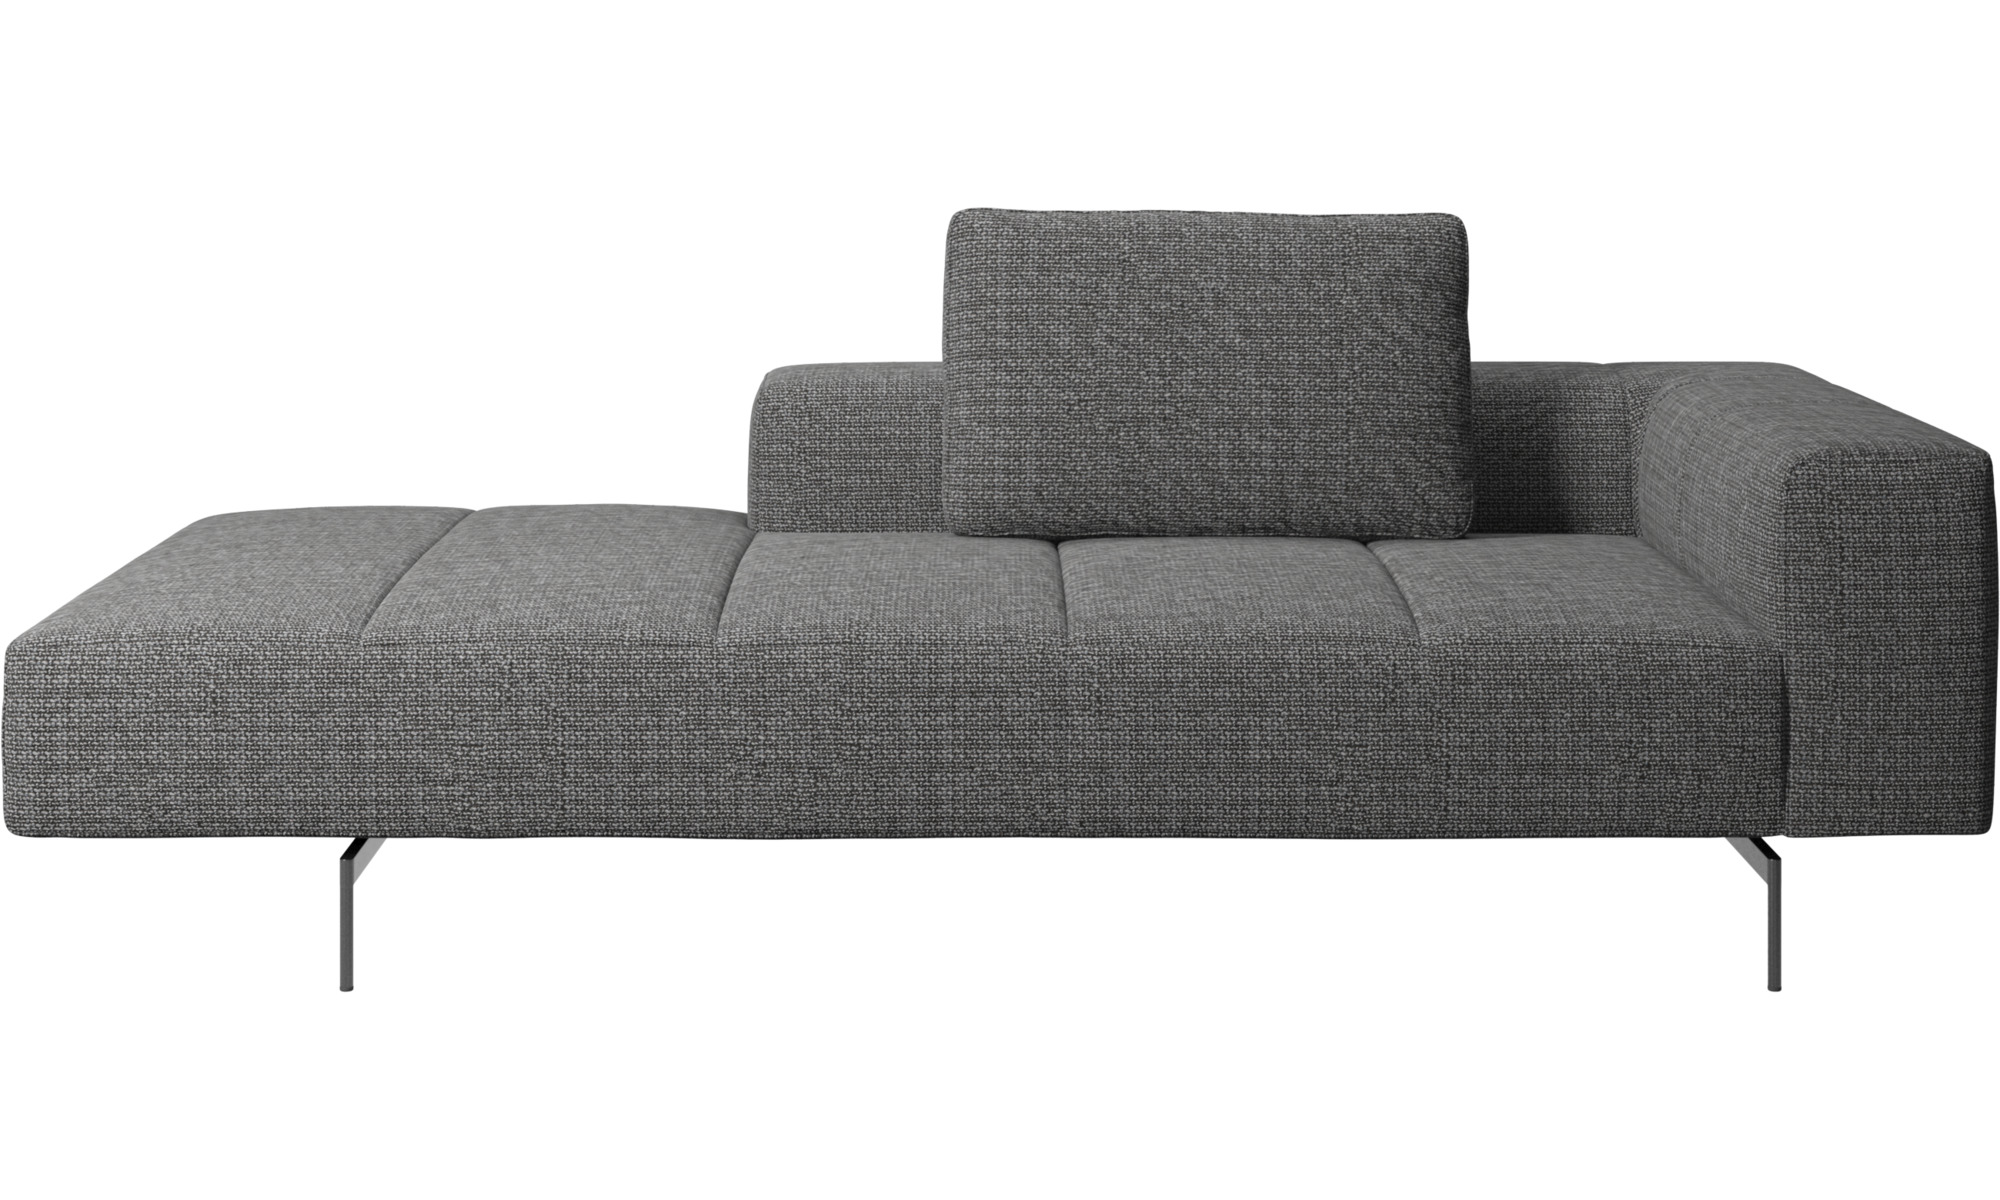 Modulære sofaer - Amsterdam modul til sofa, armlæn højre, open end venstre - Grå - Stof